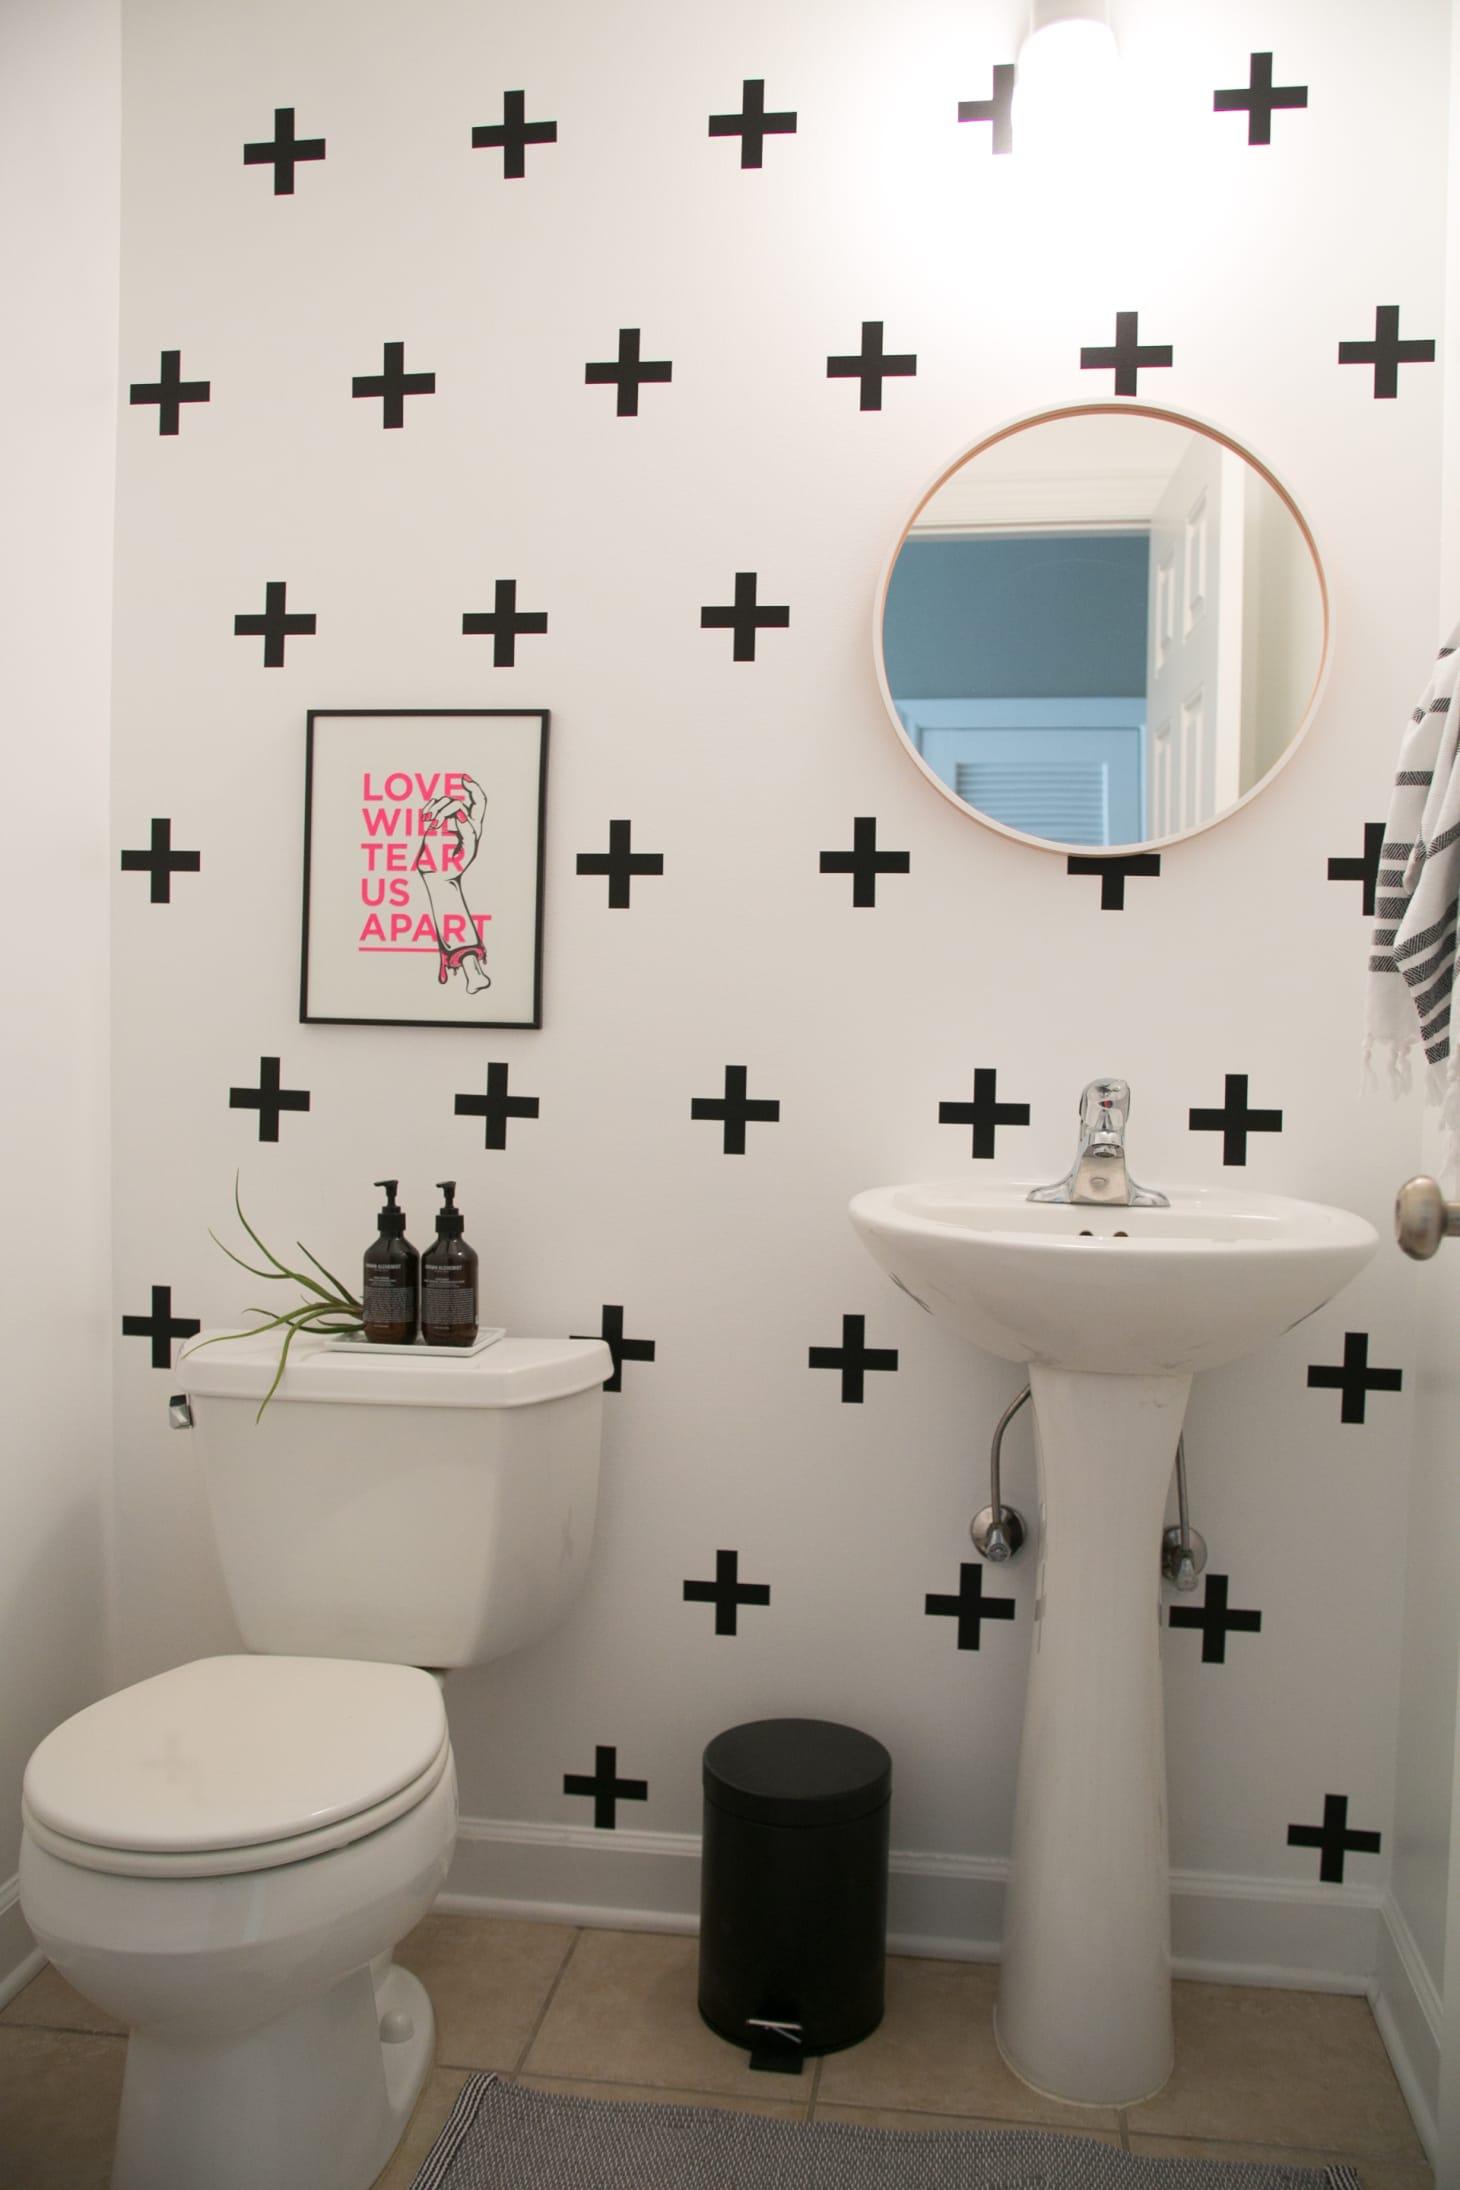 Easy Reversible Design Ideas for Rental Bathrooms ... on Apartment Bathroom Ideas  id=41859